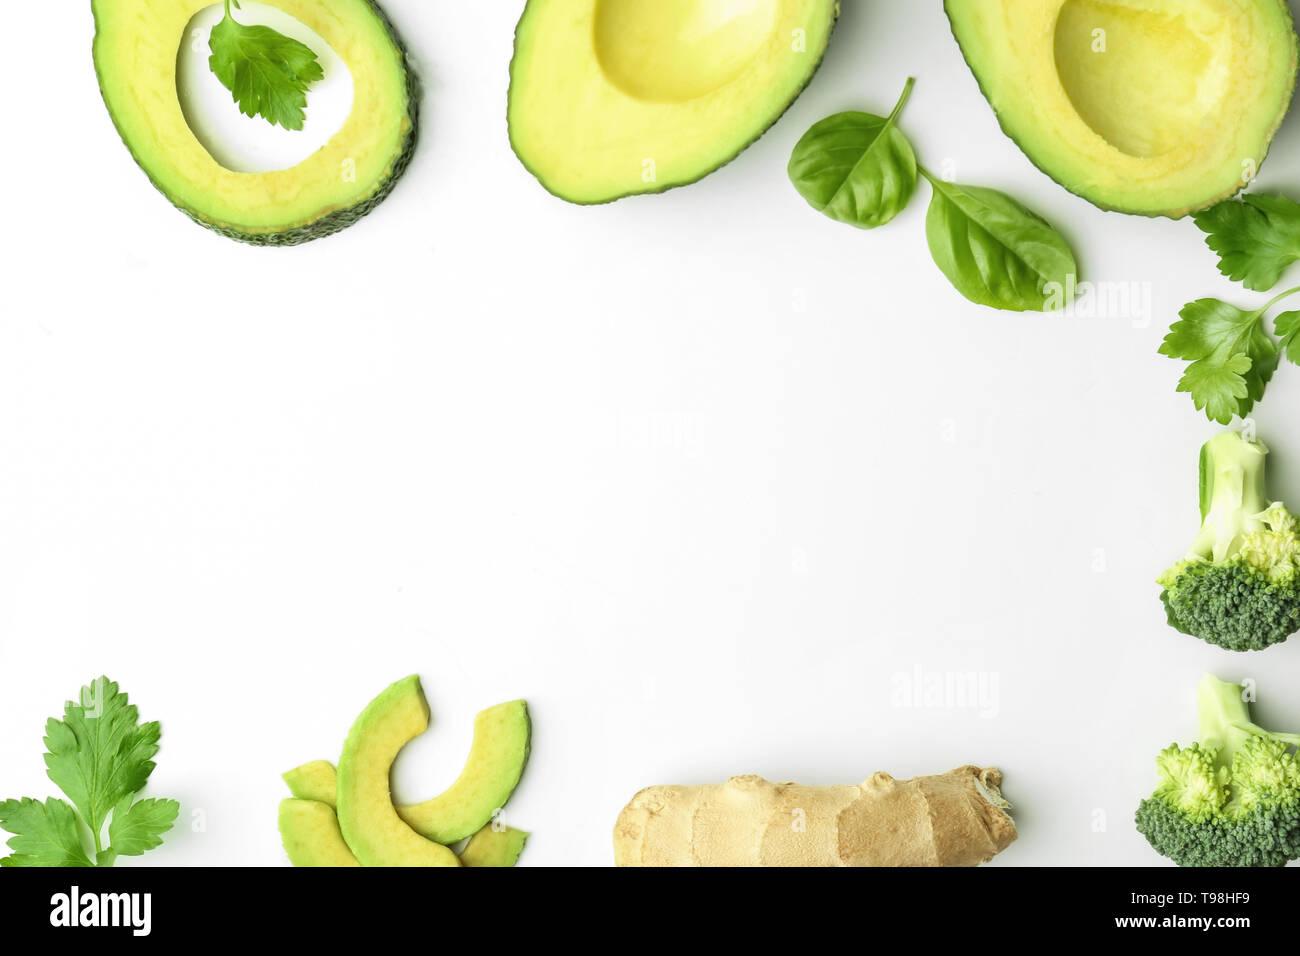 Frame made of sliced avocado on white background - Stock Image